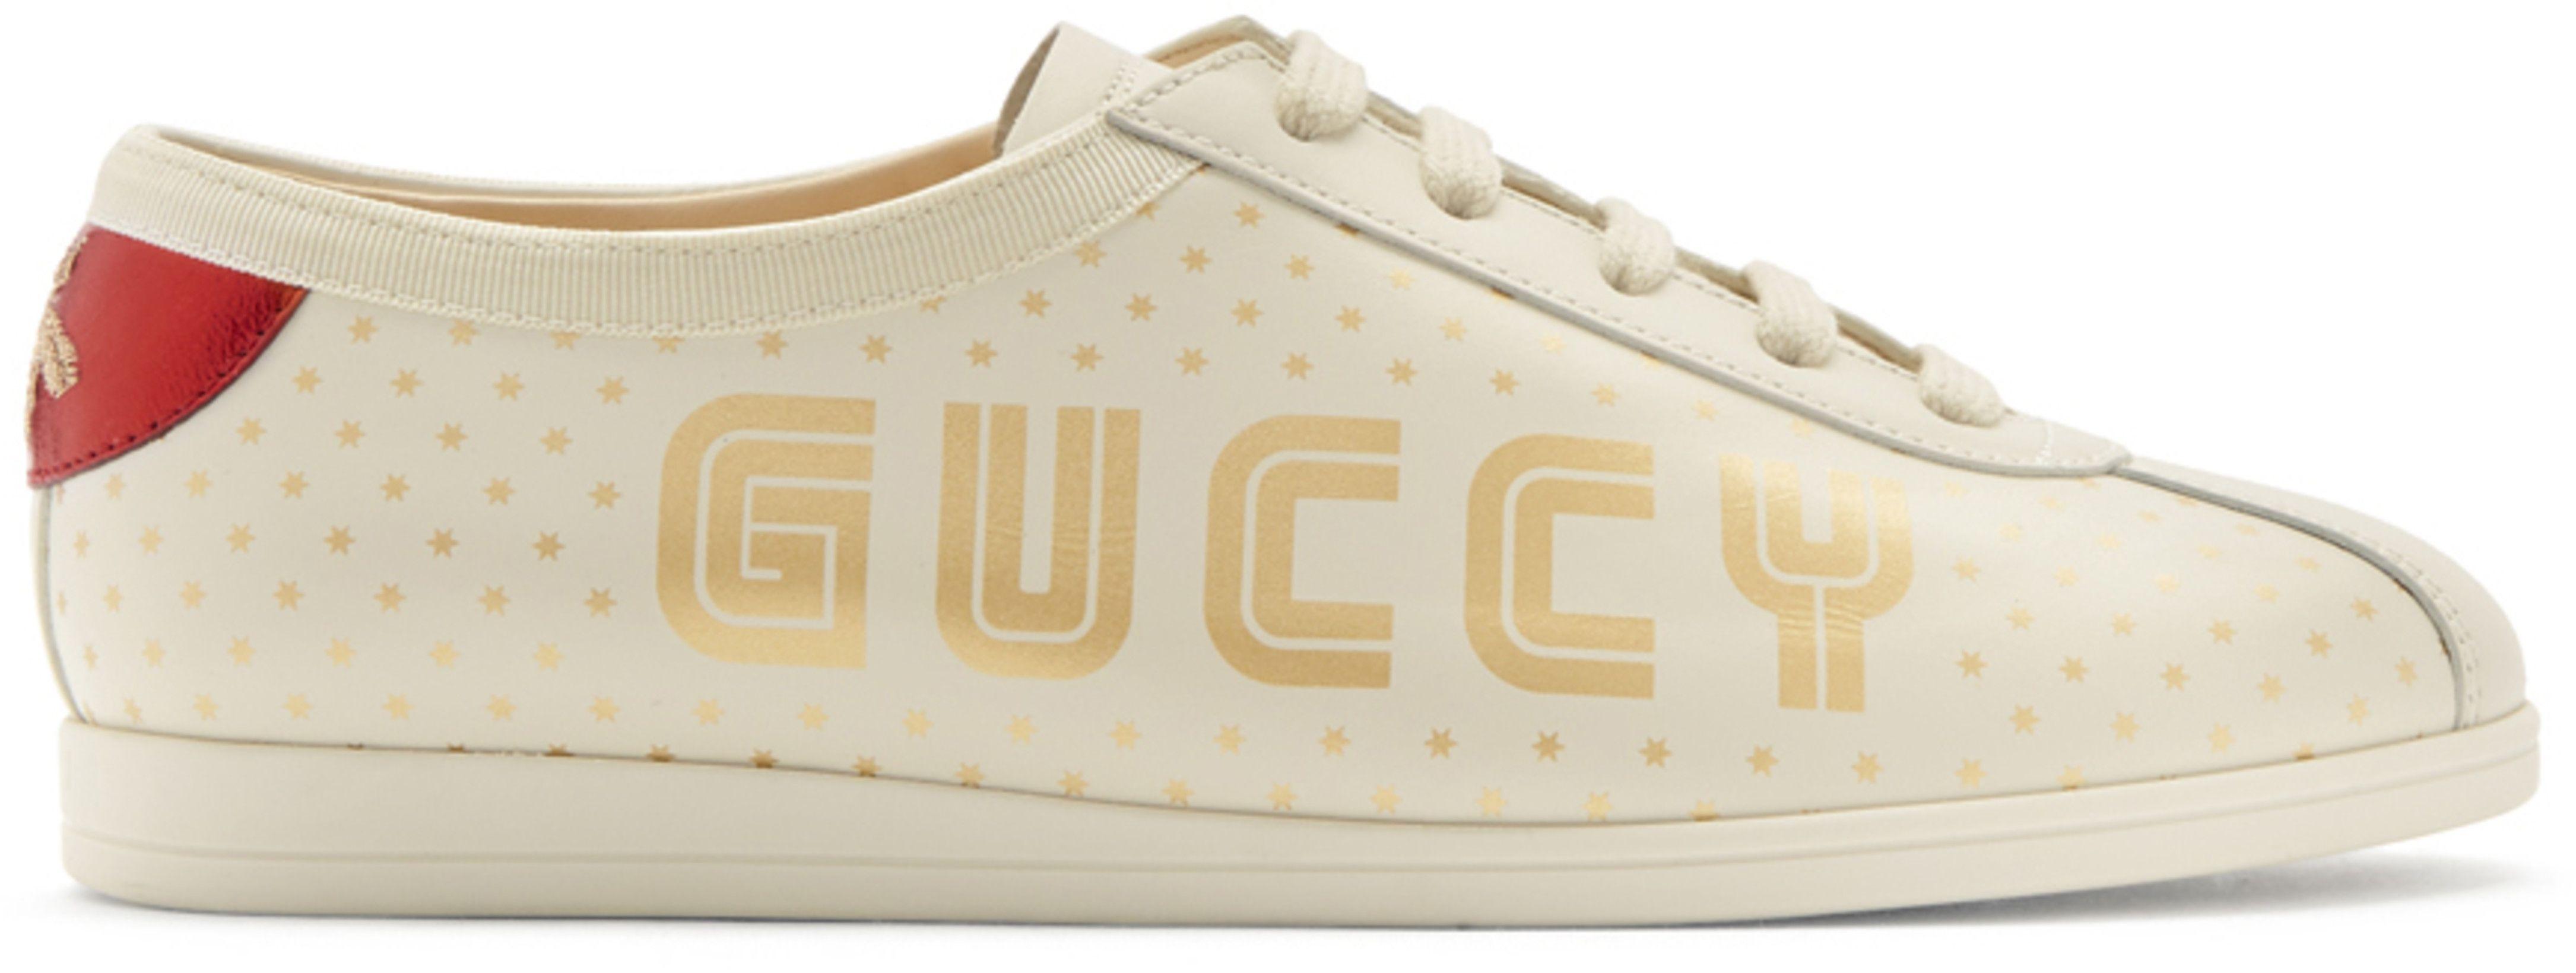 ZVCrvIXuOF White Sega Guccy Falacer Bowling Sneakers pA7iEI3PO